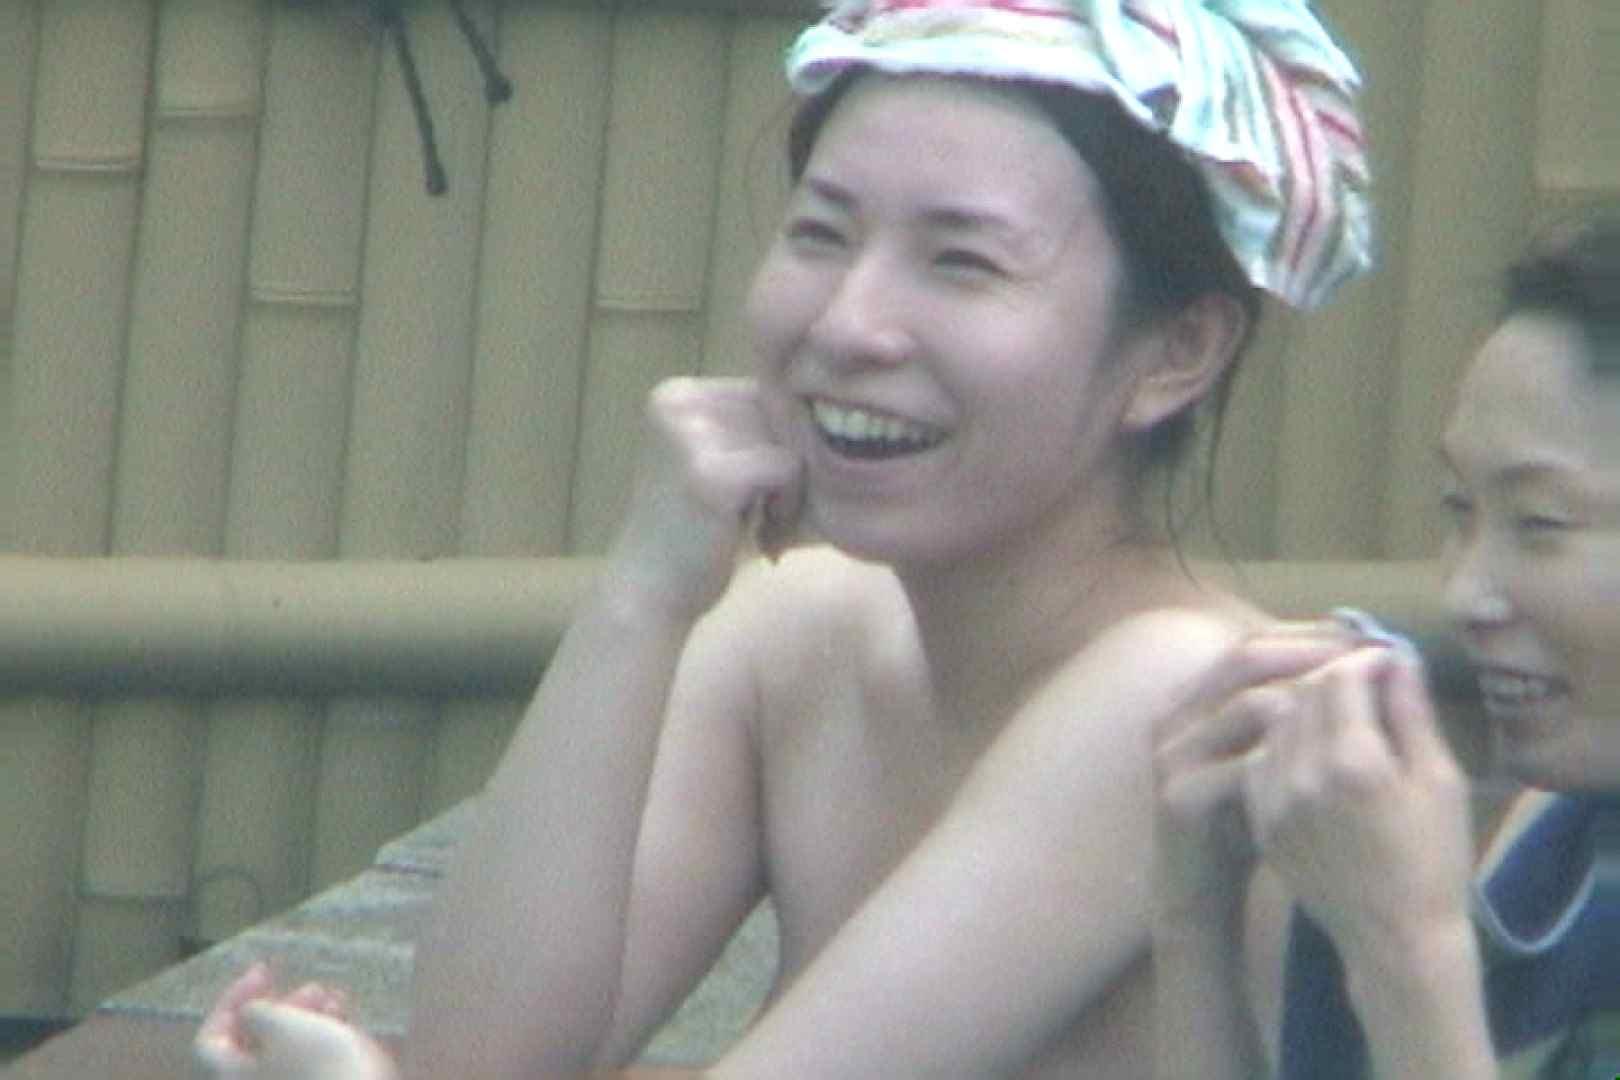 Aquaな露天風呂Vol.106 OLセックス 隠し撮りおまんこ動画流出 51画像 20